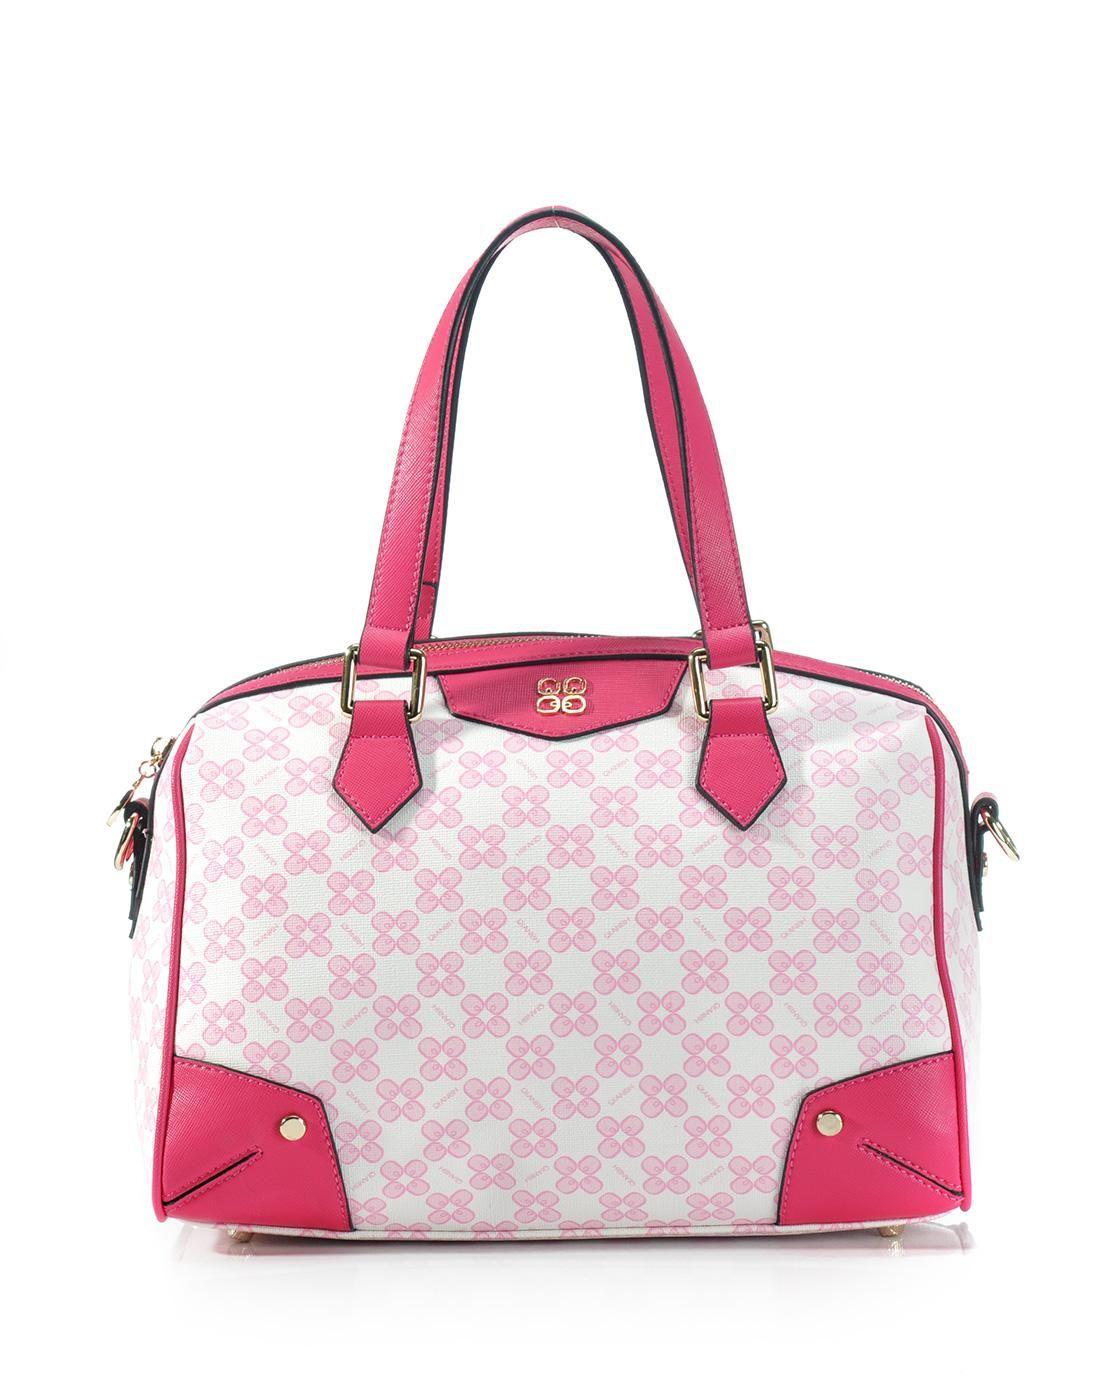 AdoreWe QIANBH Pink and White Pink Color Chain Handbag - AdoreWe.com ... d4f8beeebb3f0